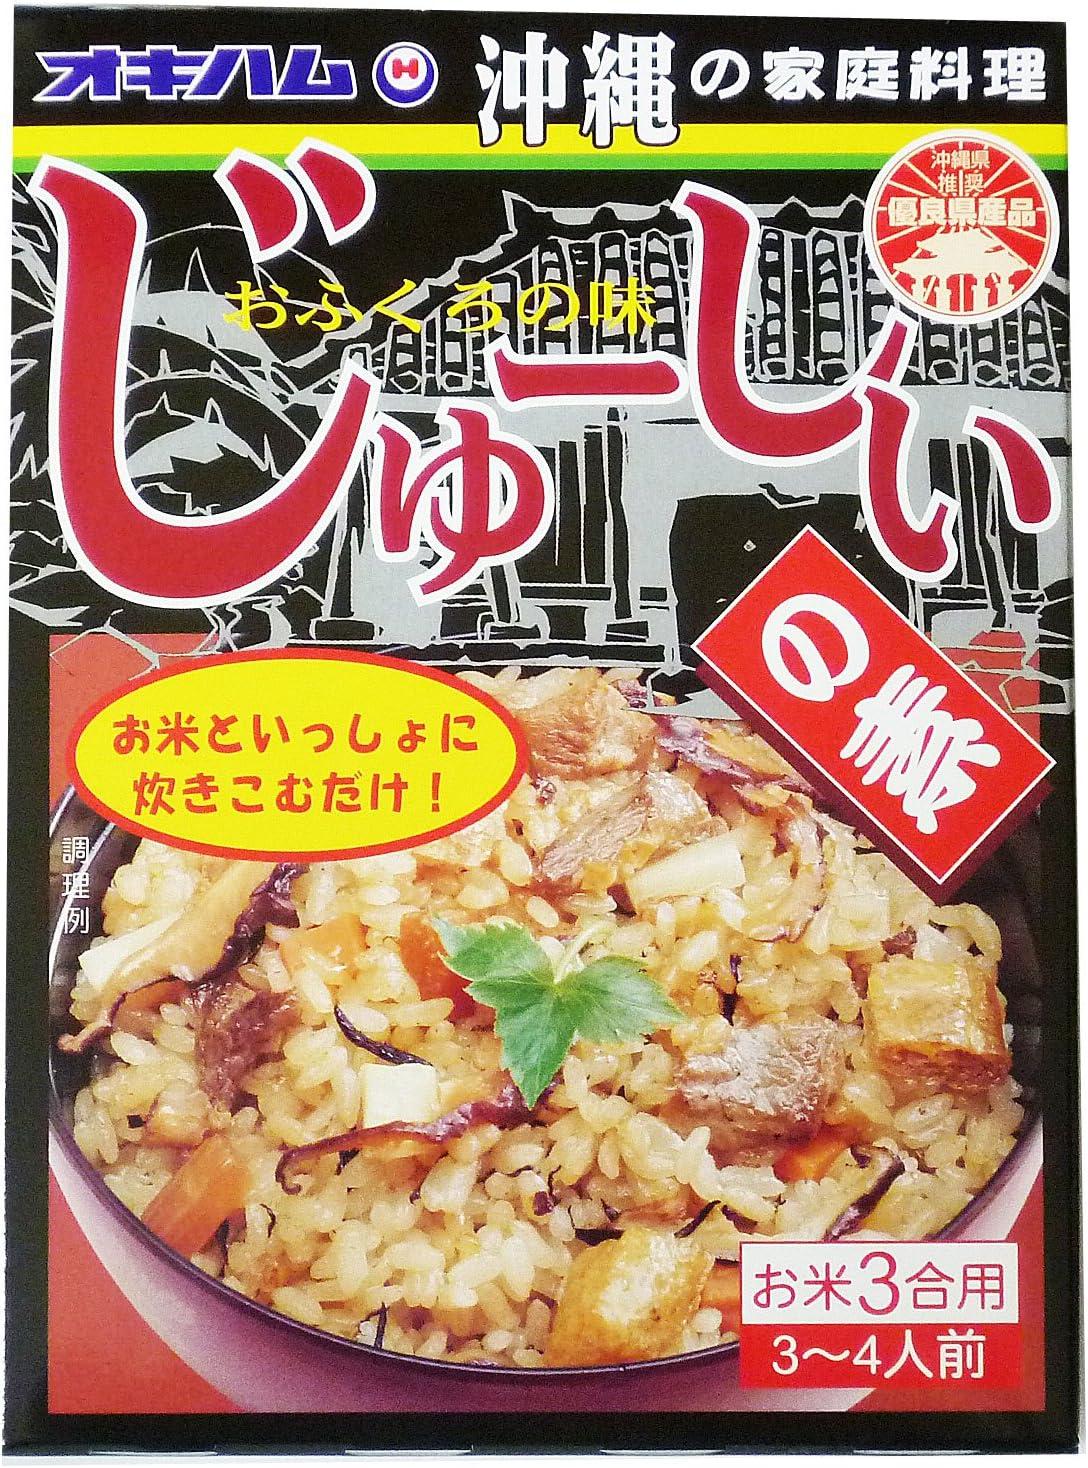 Amazon | オキハム じゅーしいの素 5個セット | 沖縄ハム総合食品 ...